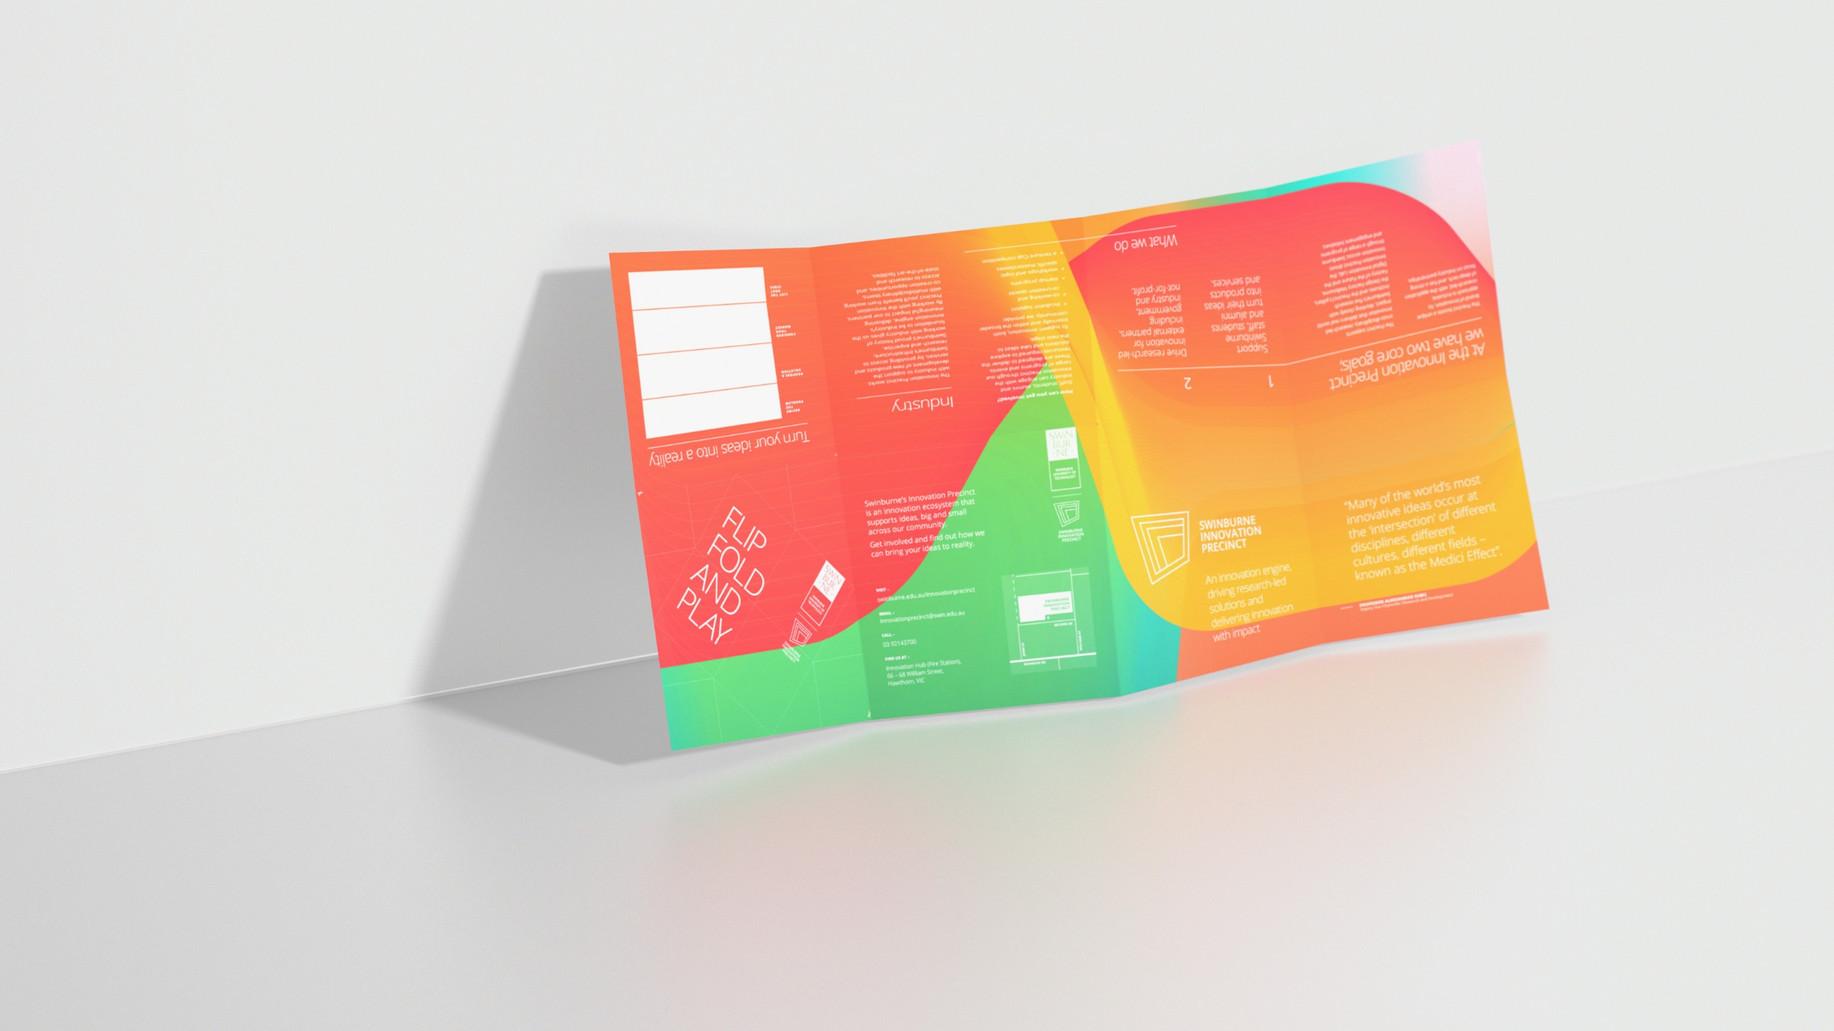 Stray-Orbit_Innovation-Precinct_Swinburne